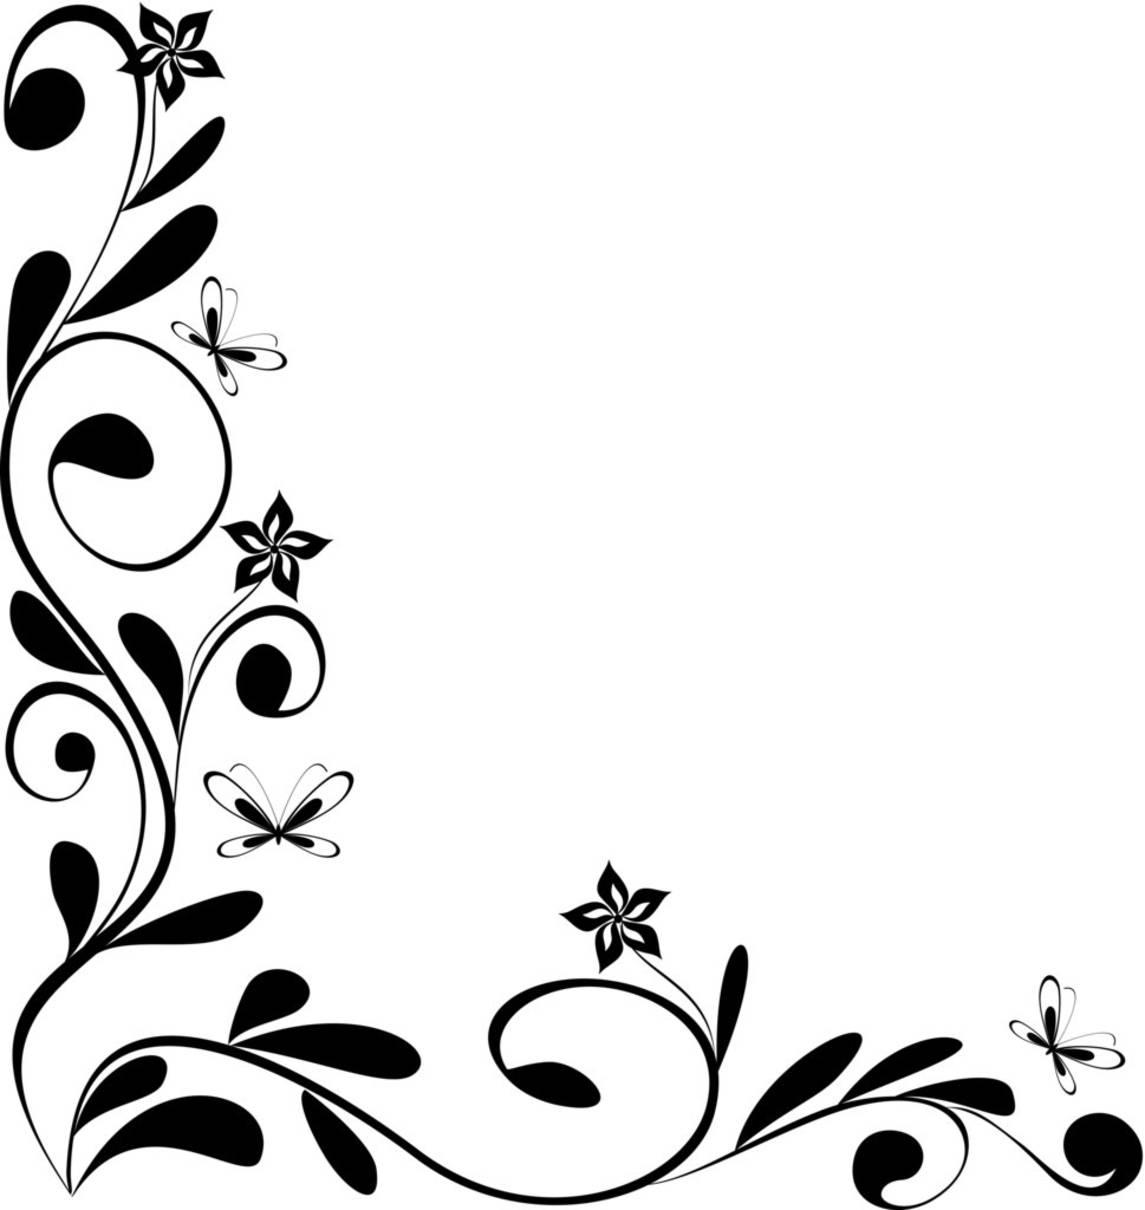 1145x1210 Clipart Corner Borders Black And White